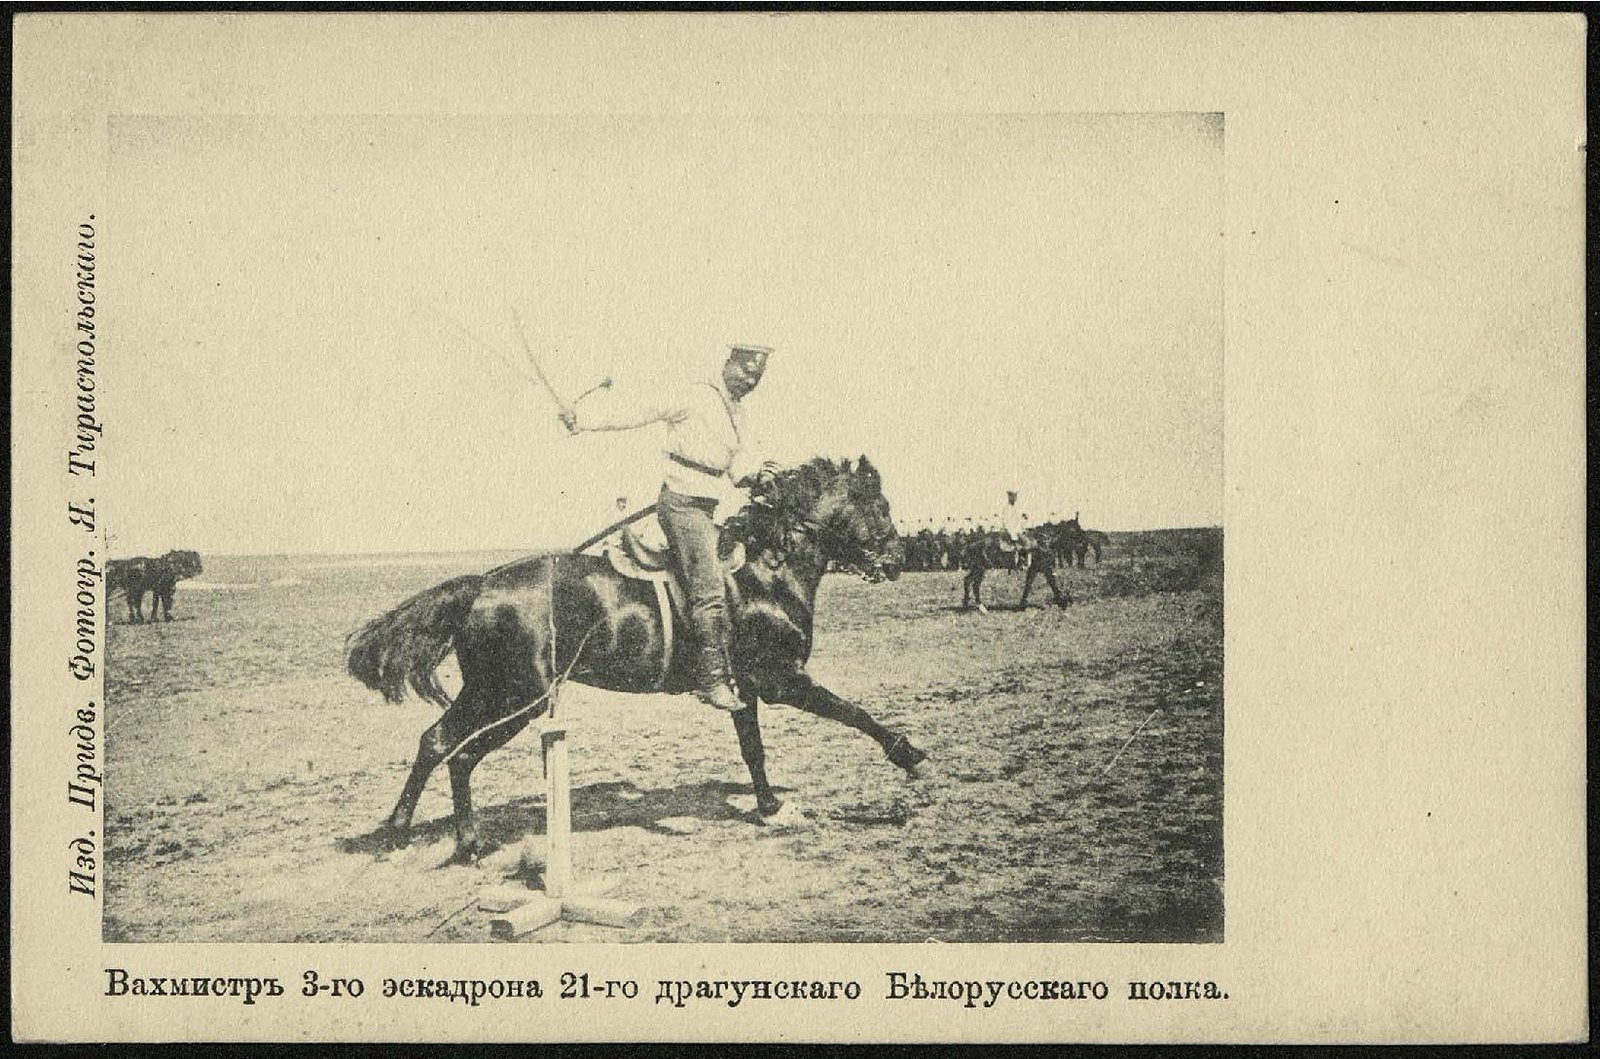 Вахмистр 3-го эскадрона 21-го драгунского Белорусского полка